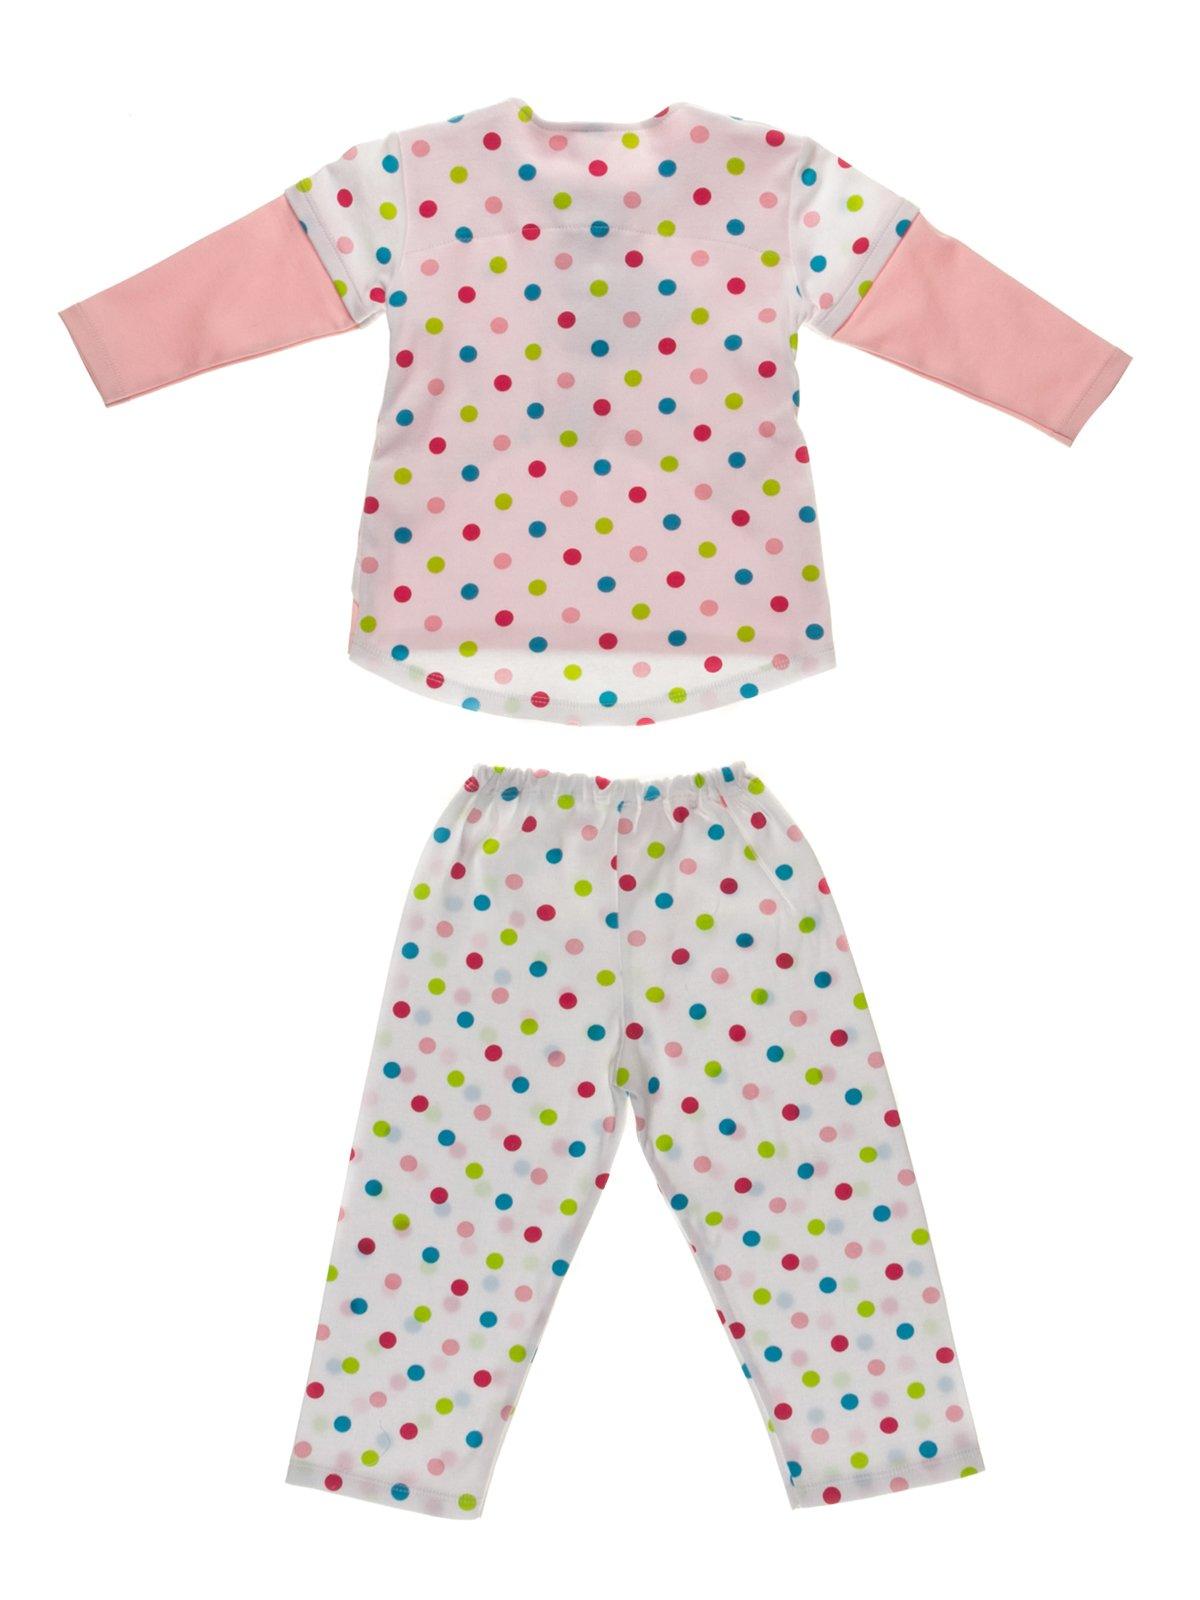 Пижама: джемпер и брюки   2929839   фото 2